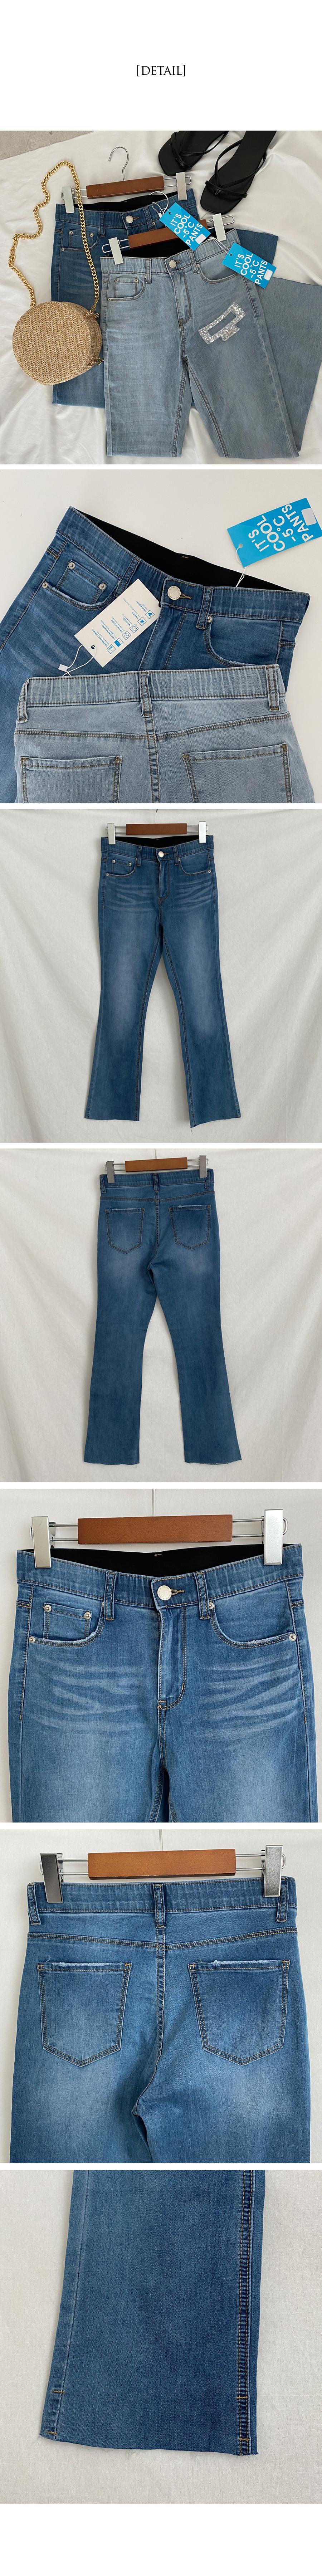 Yeats Sammy Cool Flared denim pants